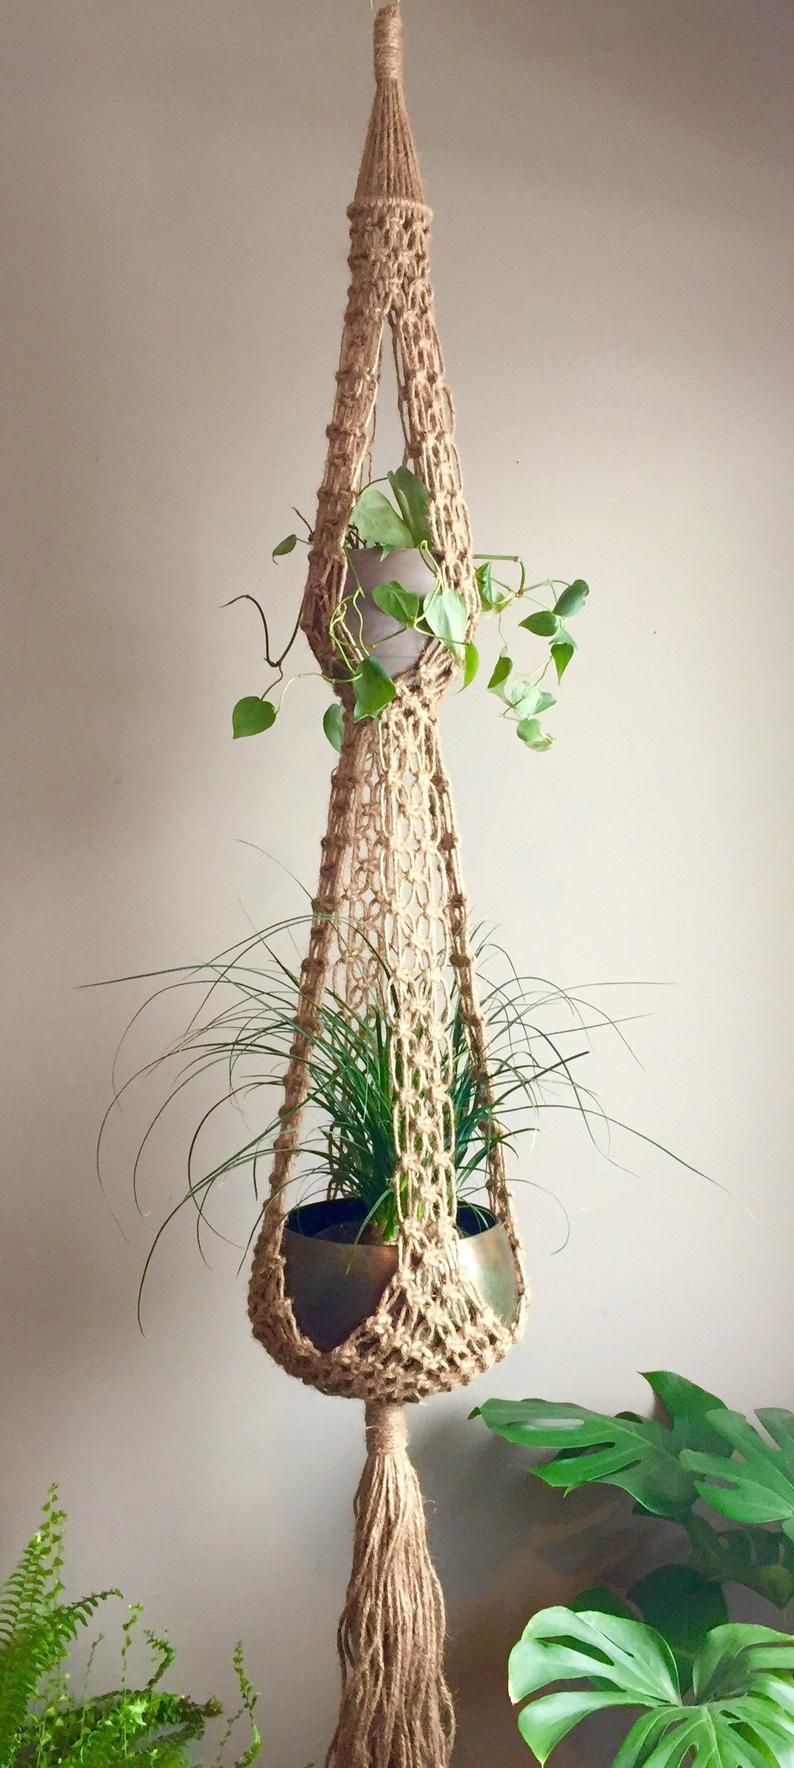 WONDERFUL NEW BOHEMIAN DOUBLE MACRAME PLANT HANGER //DREAM CATCHER TAPESTRY